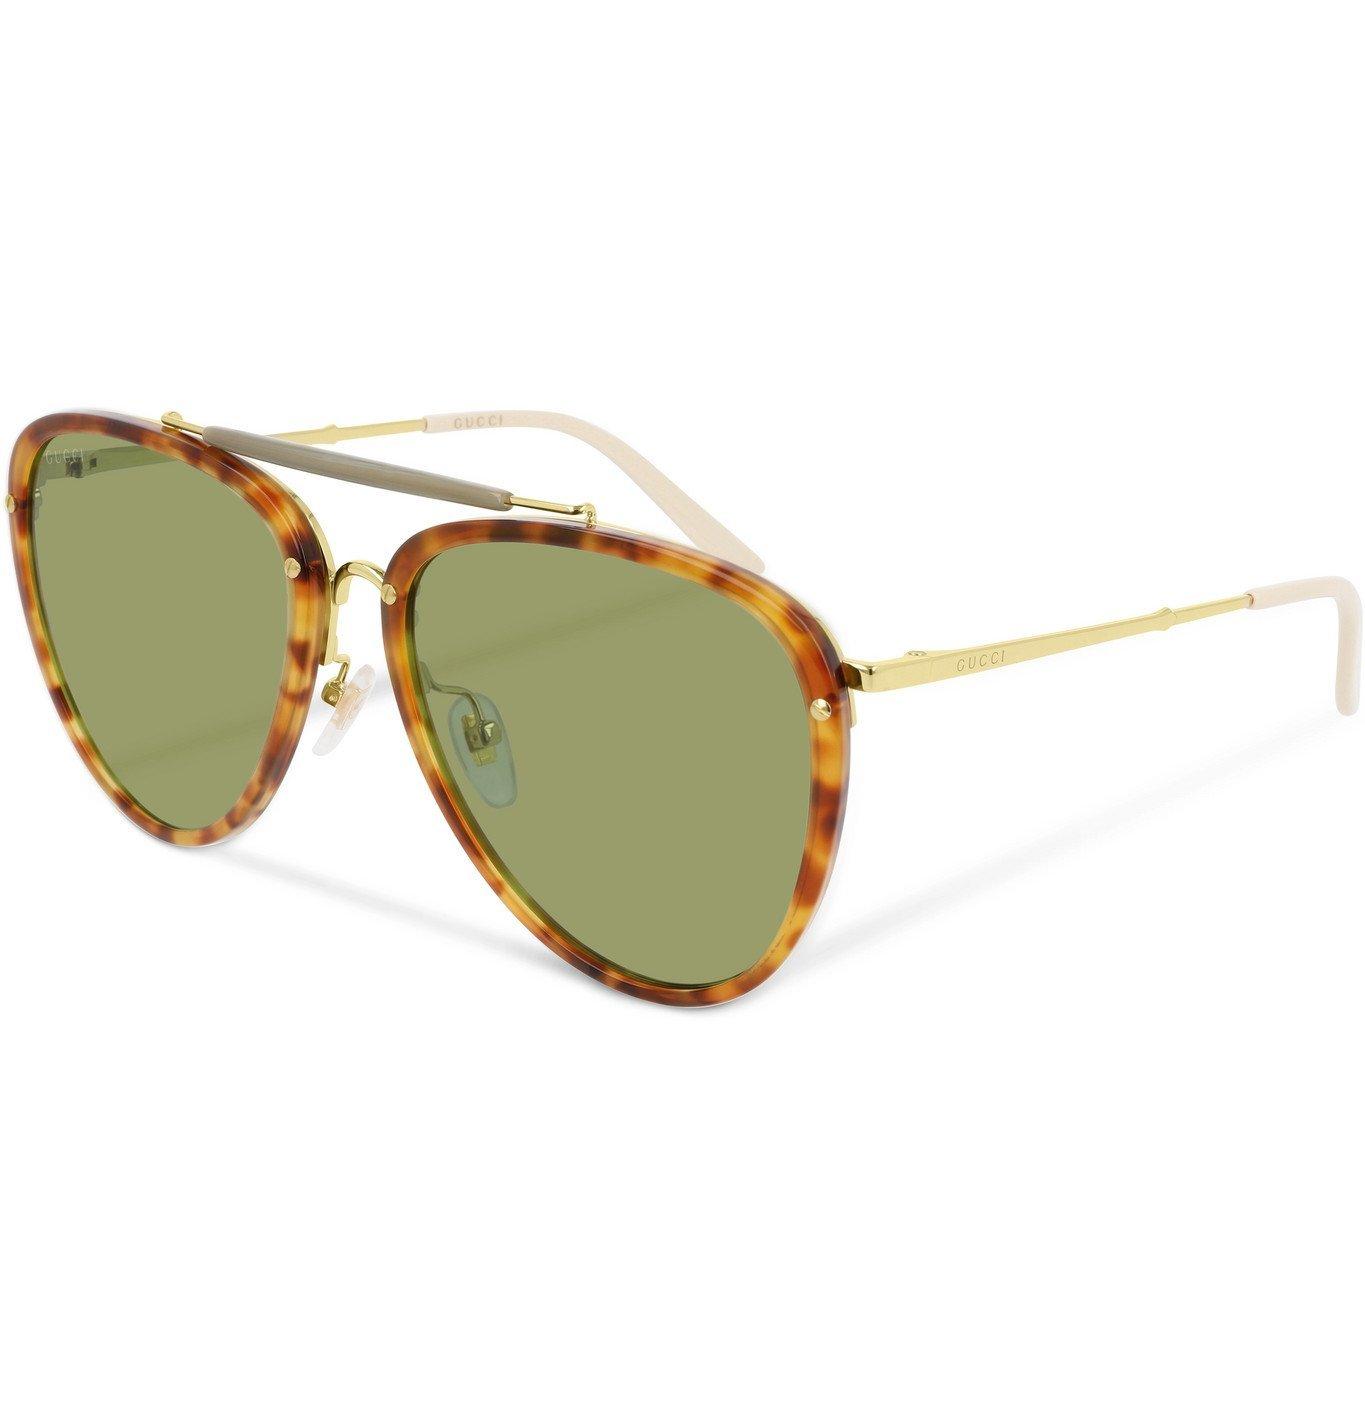 Photo: Gucci - Aviator-Style Tortoiseshell Acetate and Gold-Tone Sunglasses - Tortoiseshell